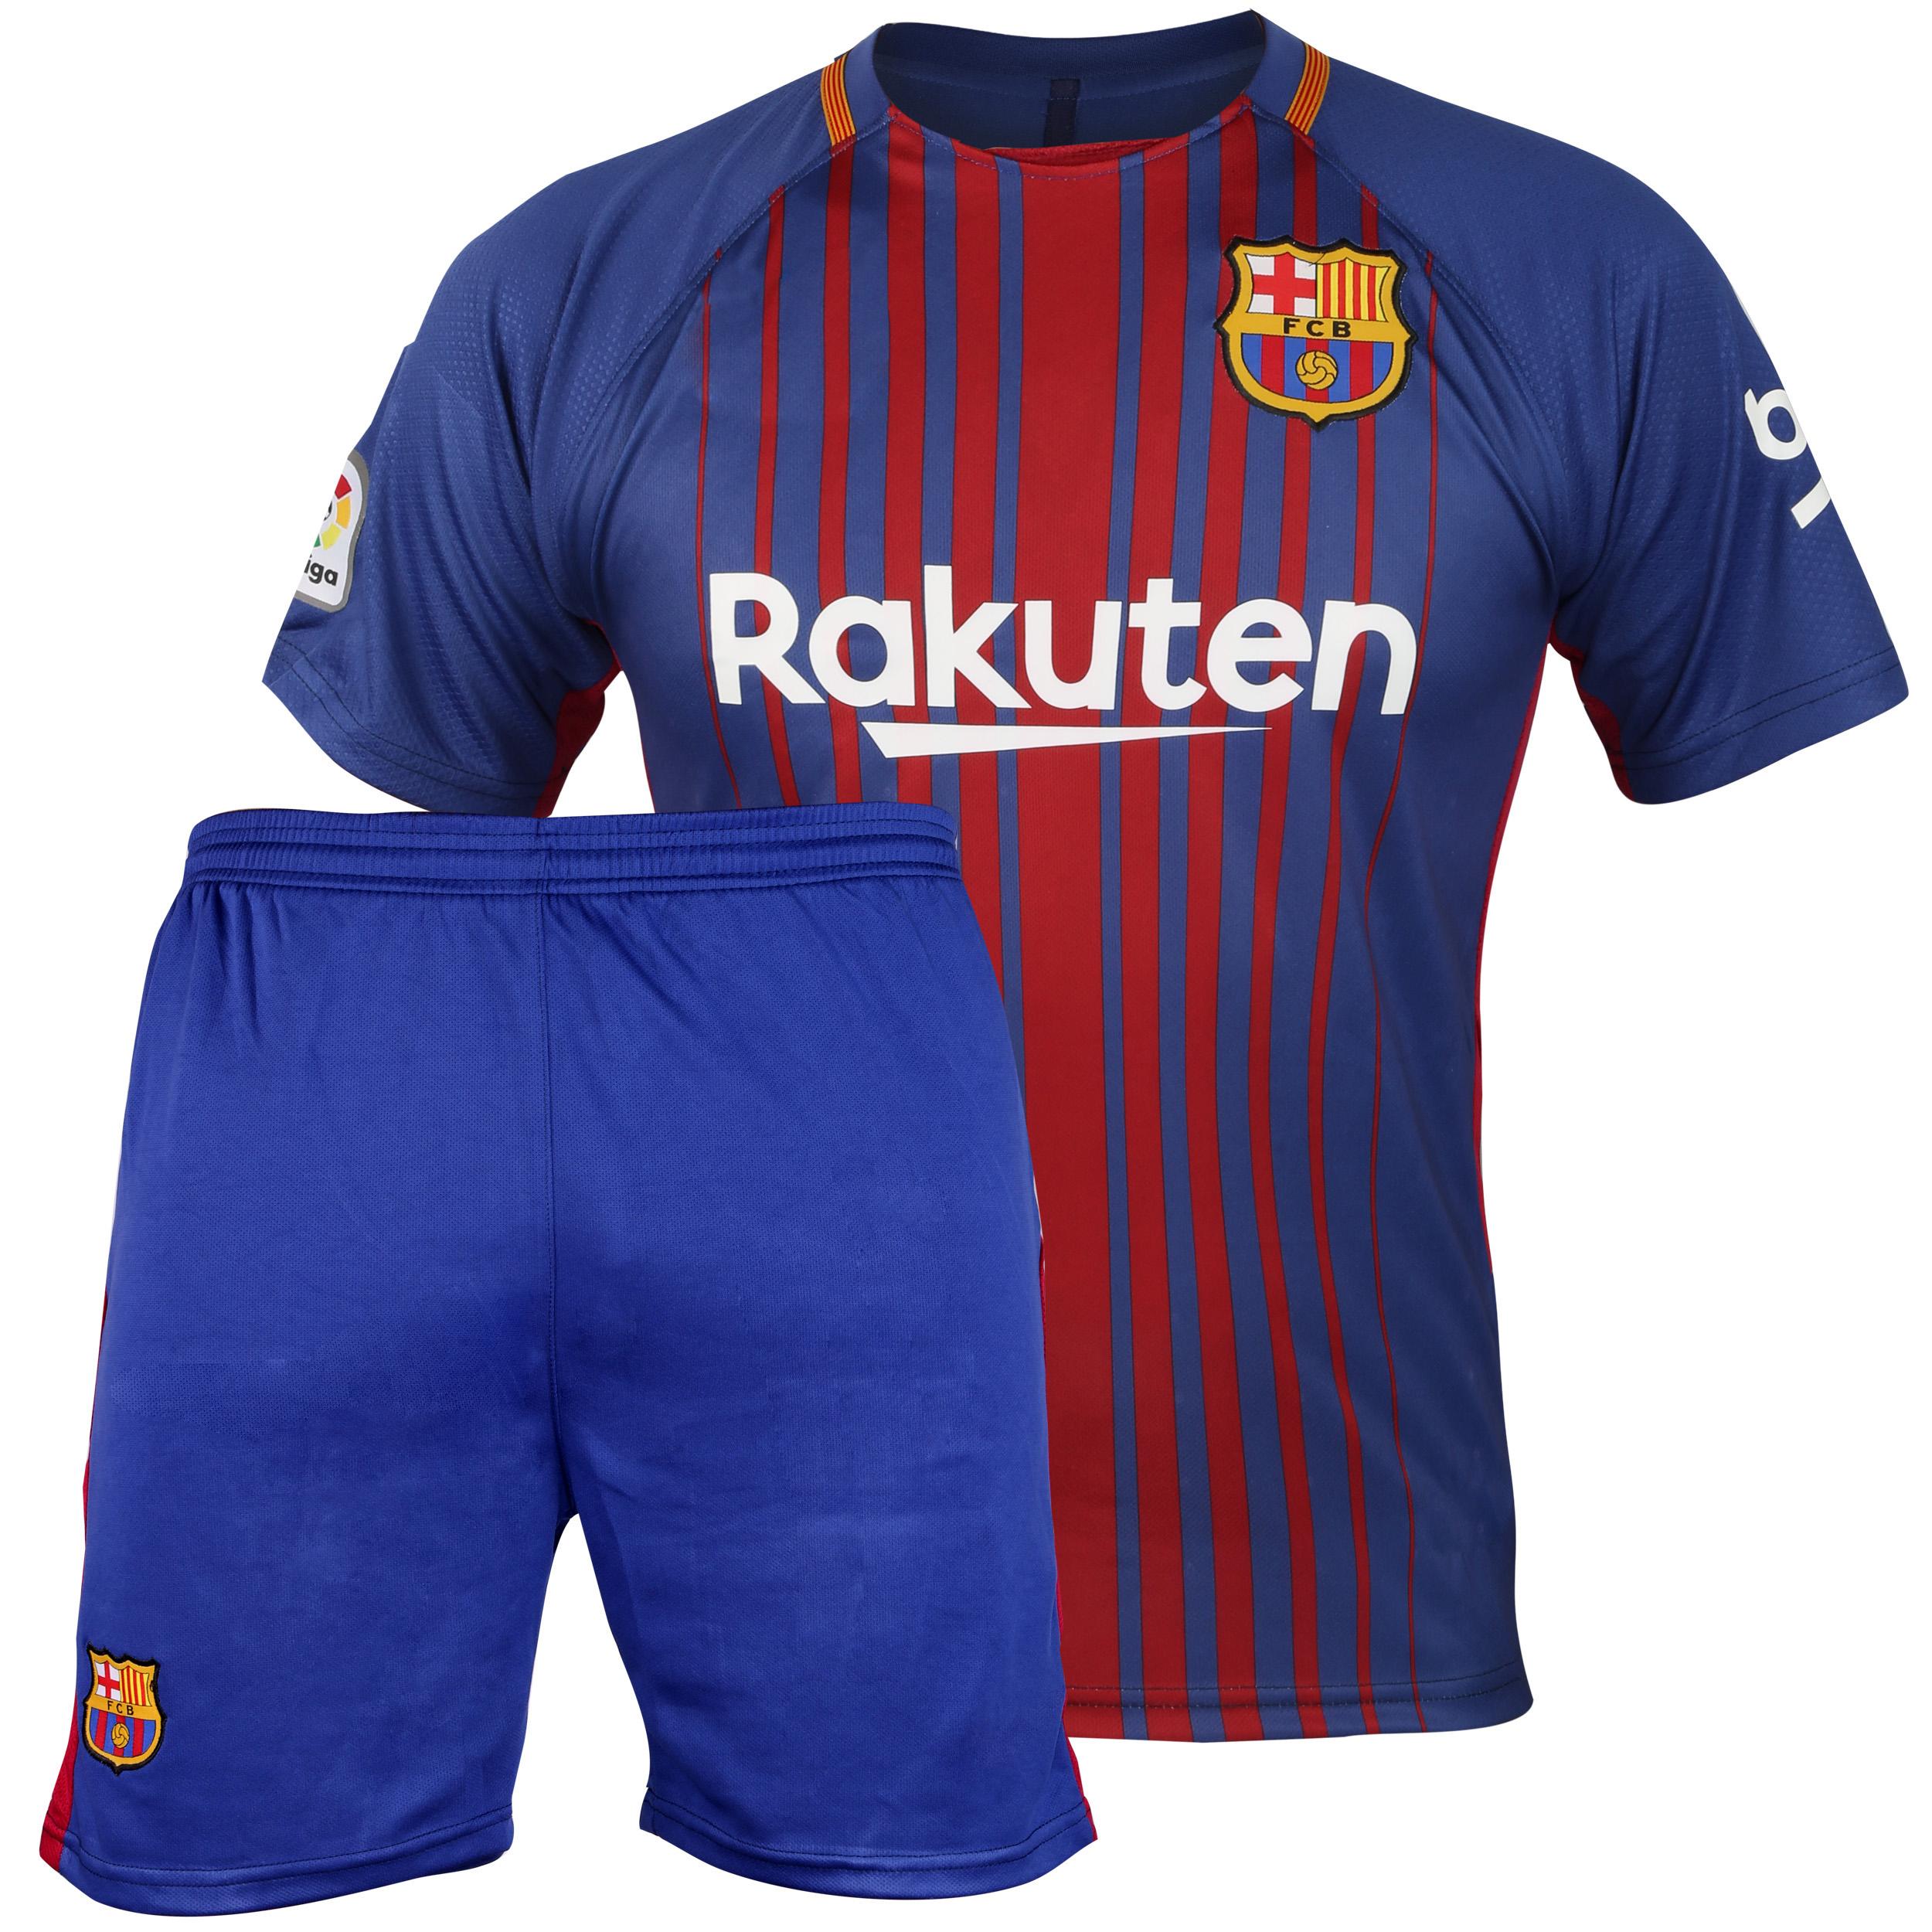 پیراهن و شورت تیم بارسلونا مدل  18-2017 home